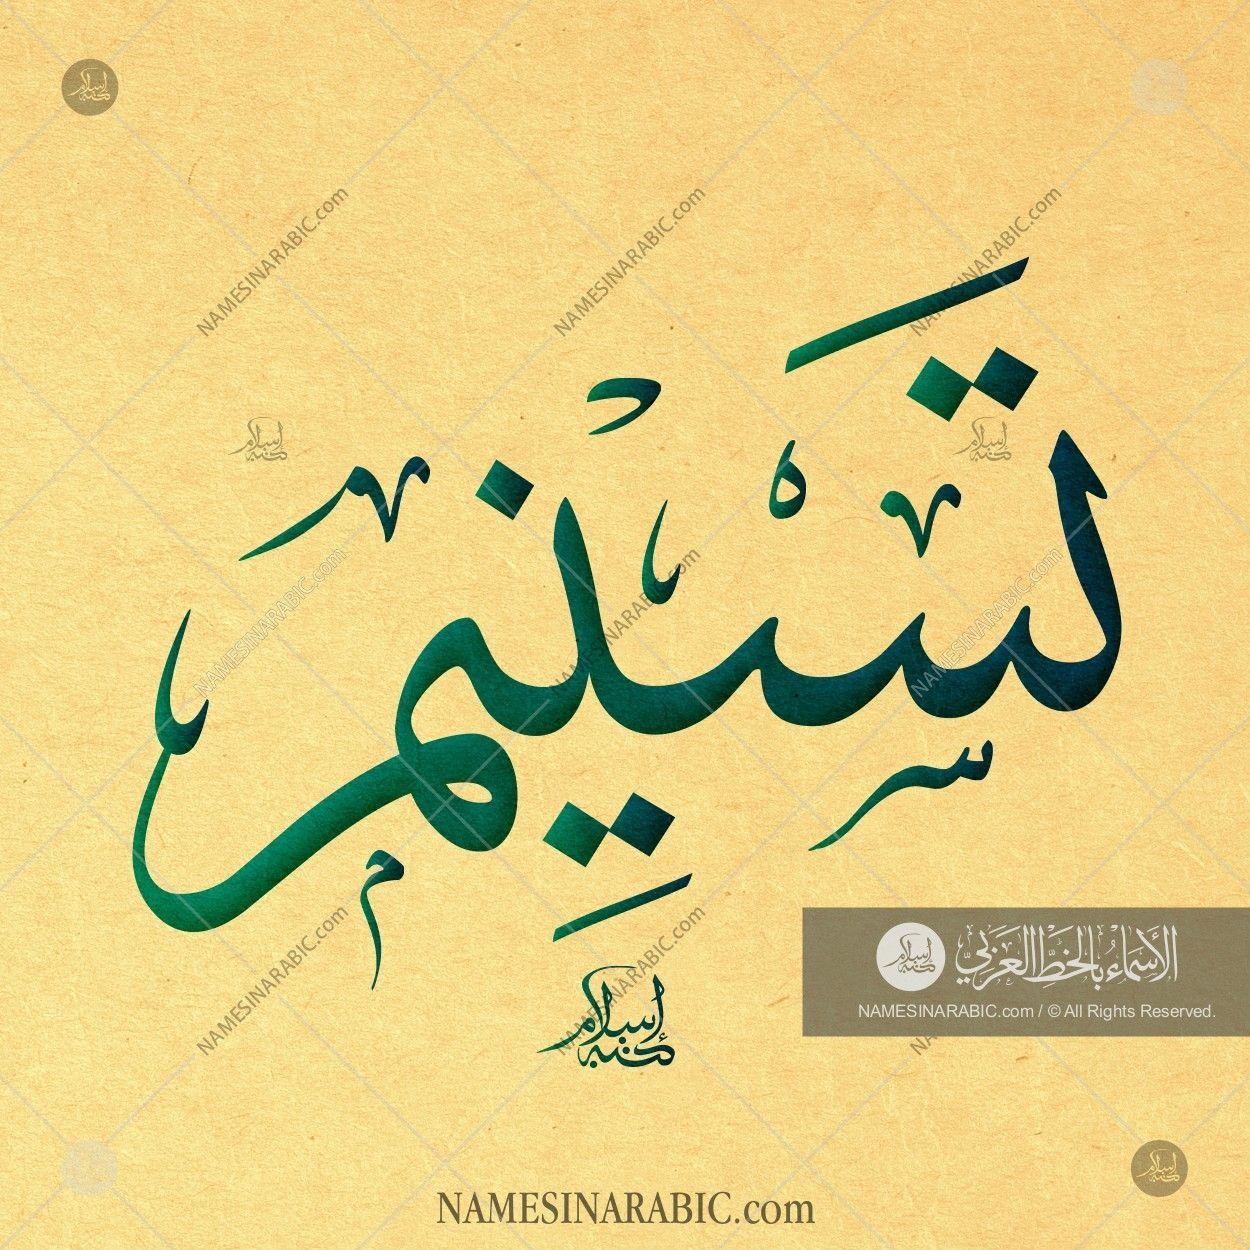 Tasnim Name In Arabic Thuluth Calligraphy Calligraphy For Beginners Calligraphy Name Arabic Calligraphy Art